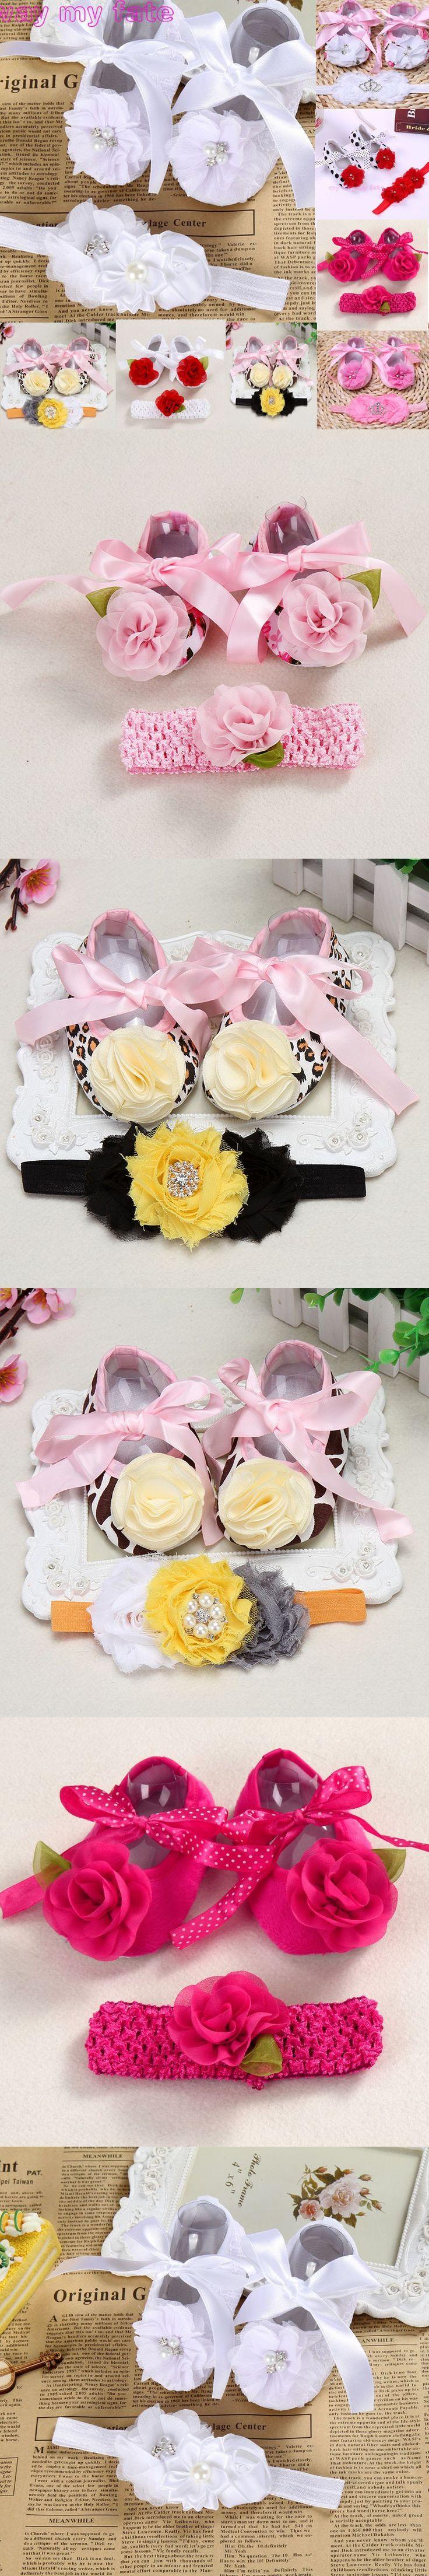 Christening baptism newborn baby girl shoes headband set,toddler infant fabric baby booties for newborn girl